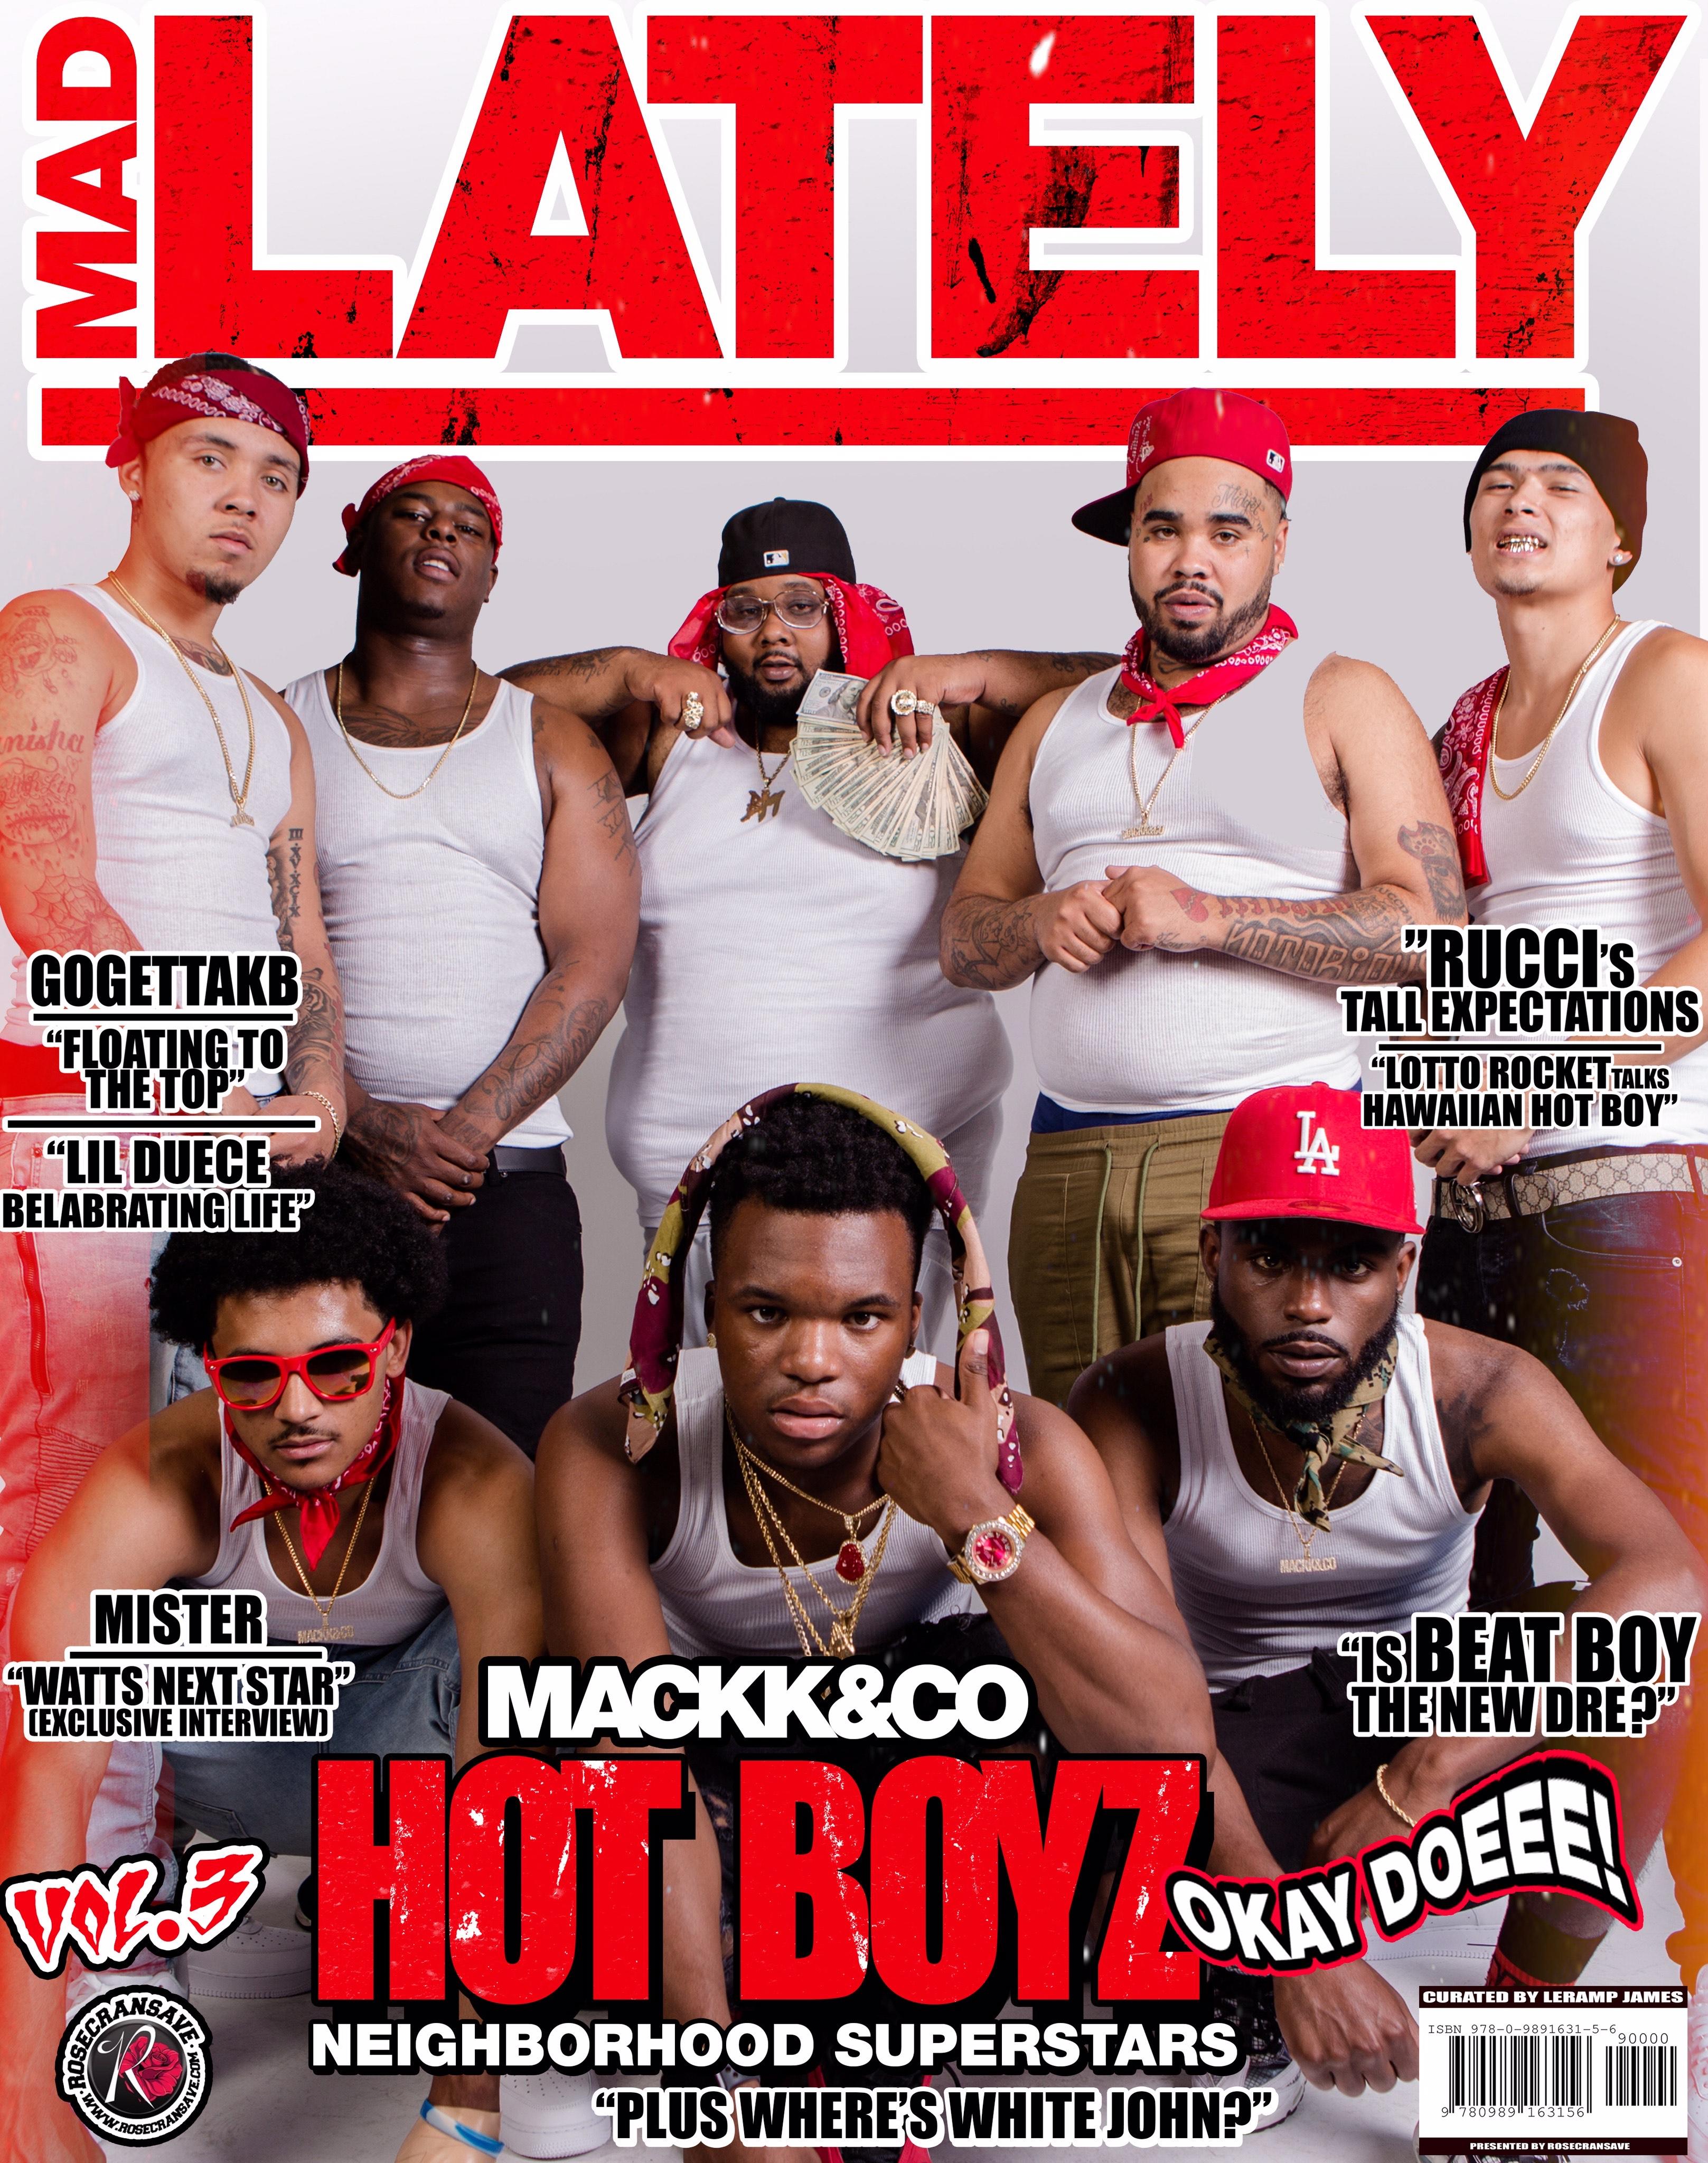 Mad LAtely Vol. 3: Mackk N Co Hot Boyz